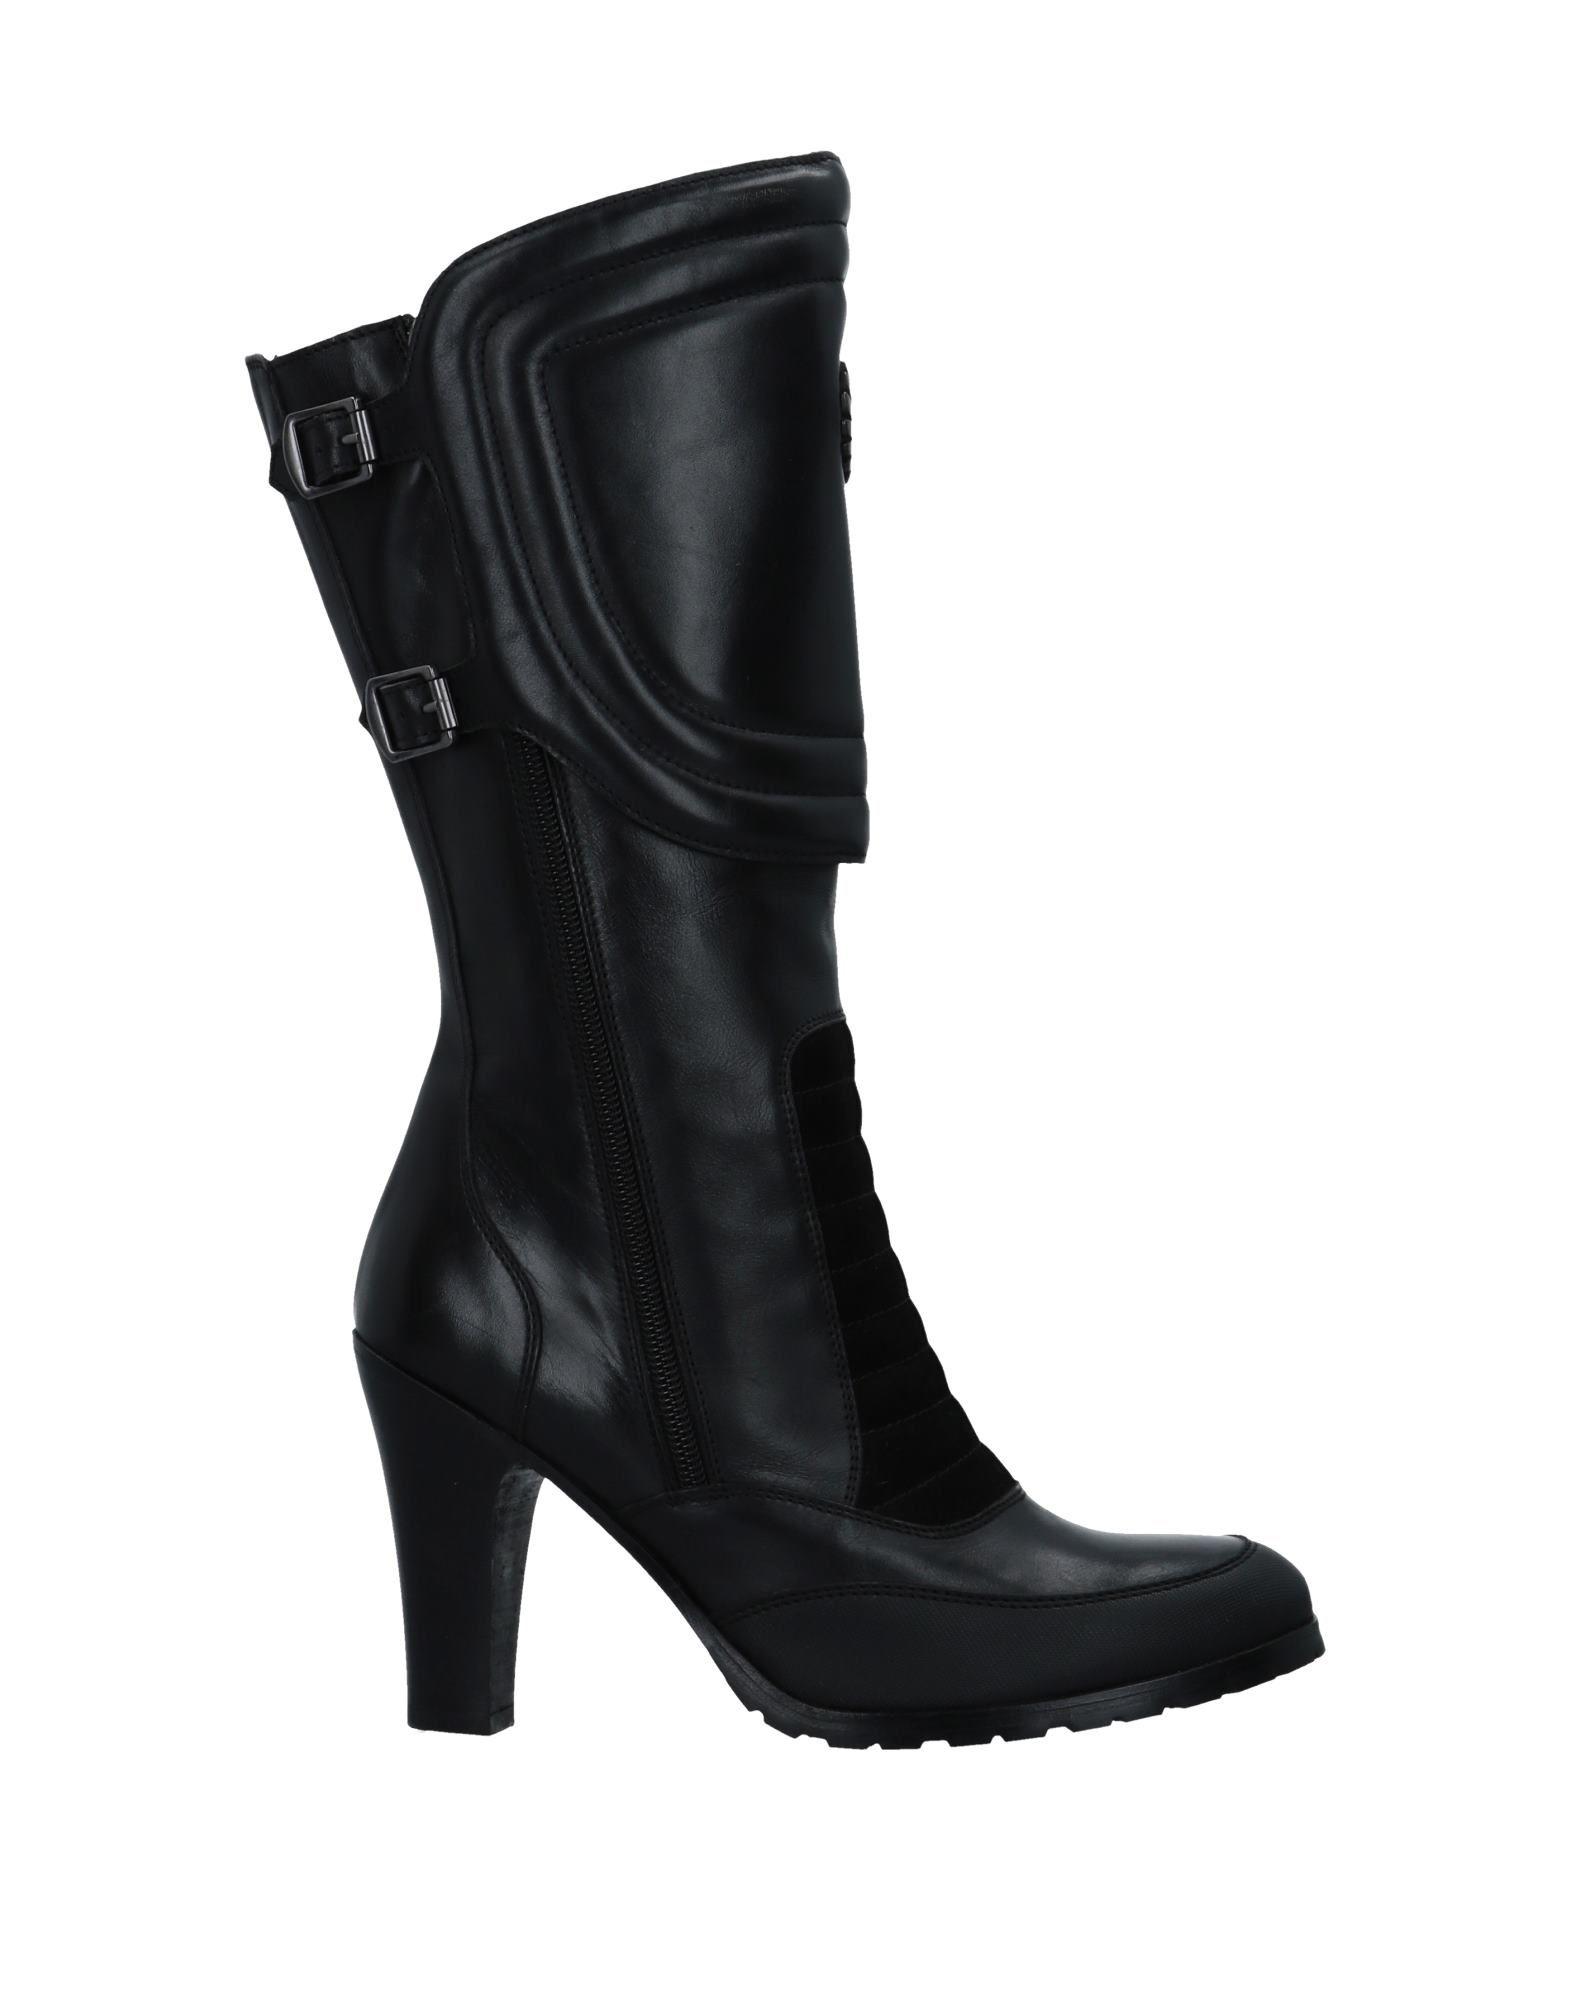 Belstaff Stiefel Damen  11536806OJGünstige Schuhe gut aussehende Schuhe 11536806OJGünstige a2a724